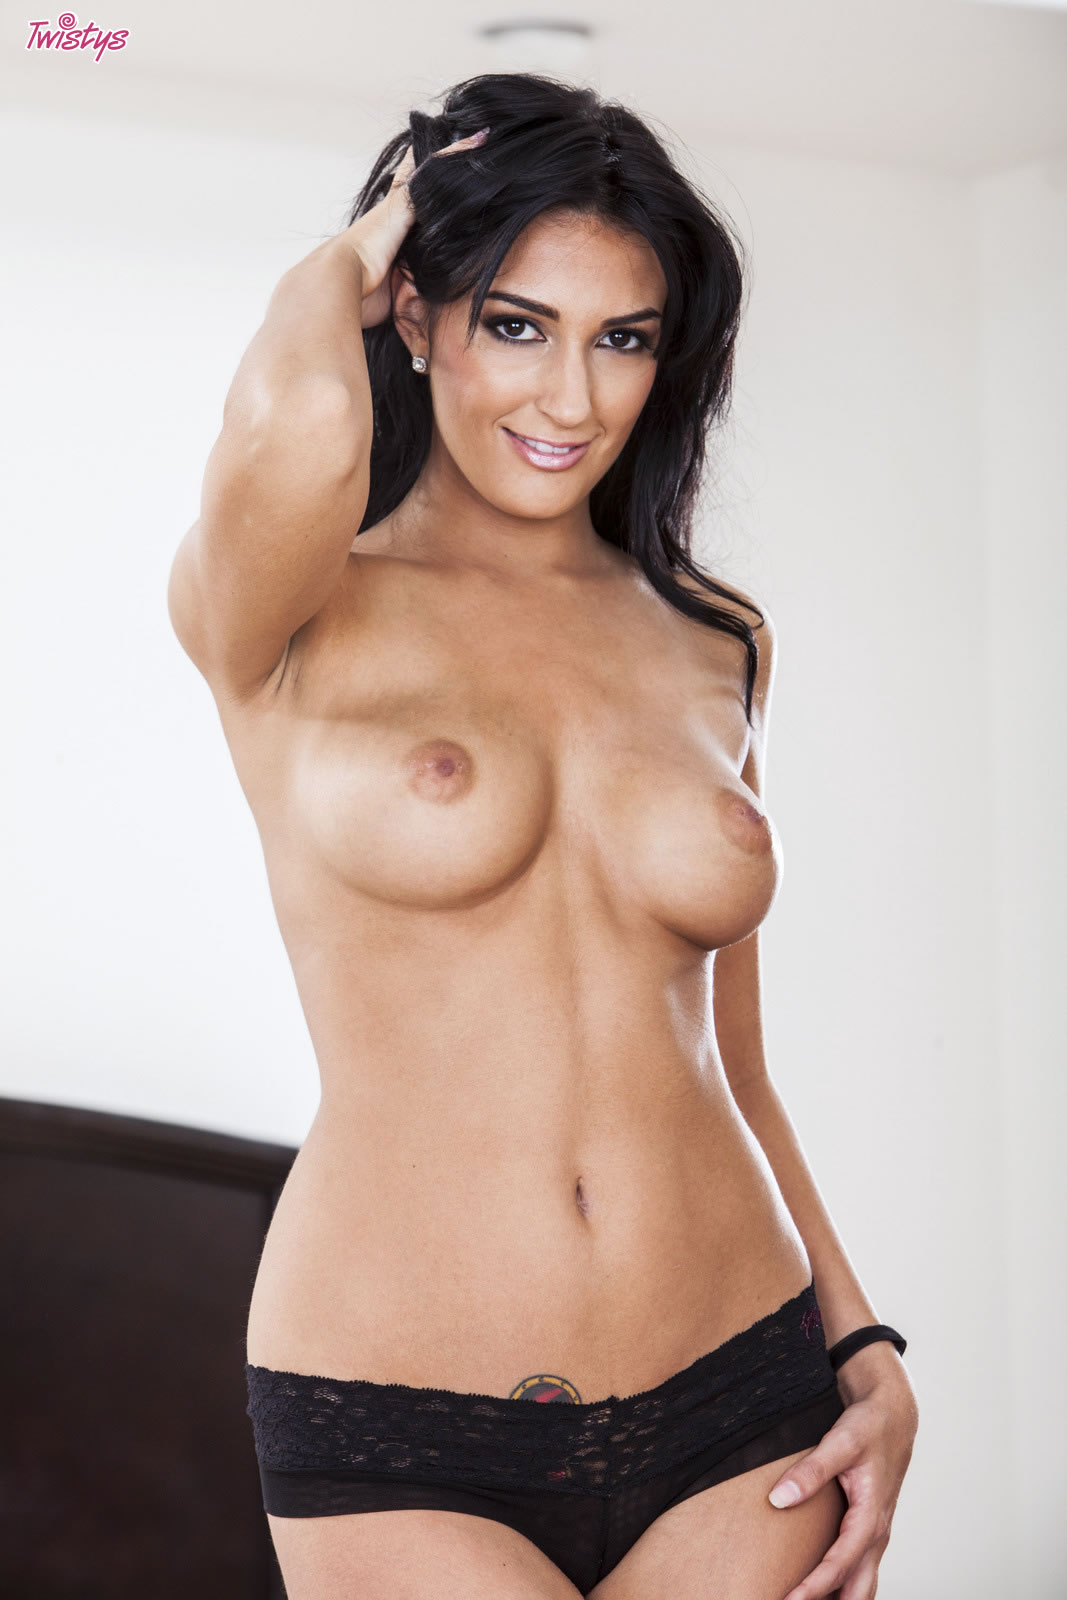 Amber cox nudes, lena farugia pornsex download